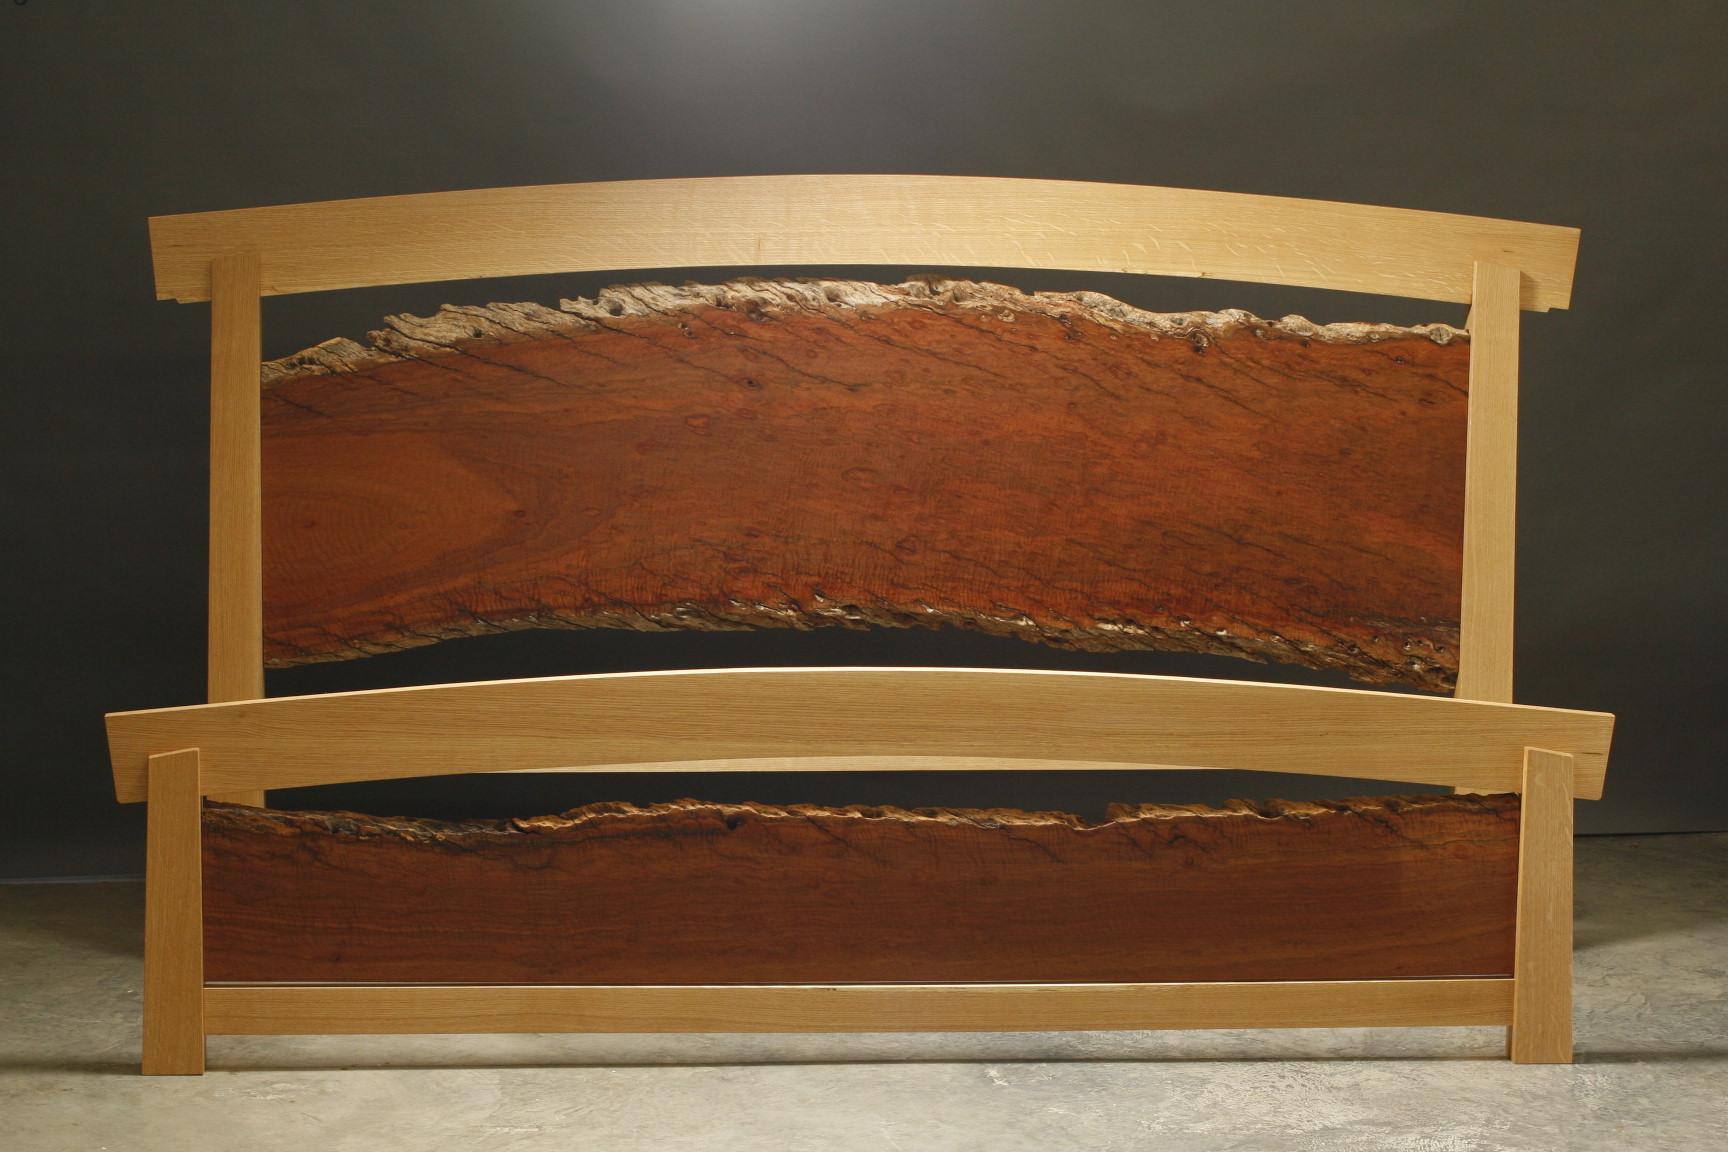 New England White Oak bed frame